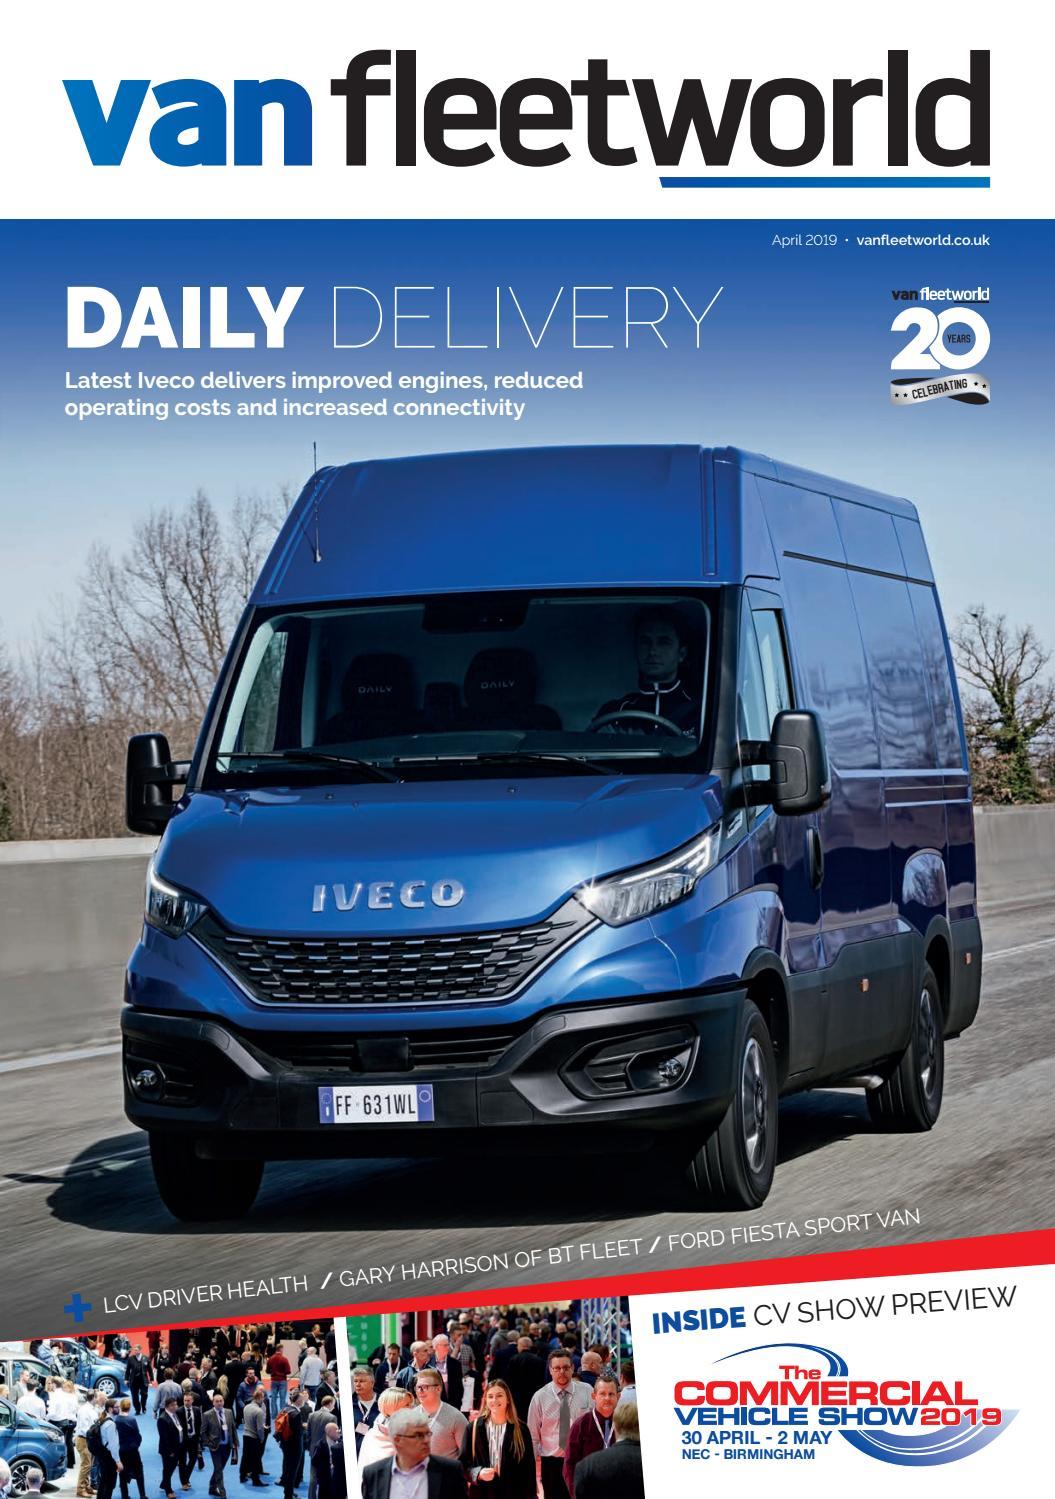 Van Fleet World April 2019 by Fleet World Group - issuu